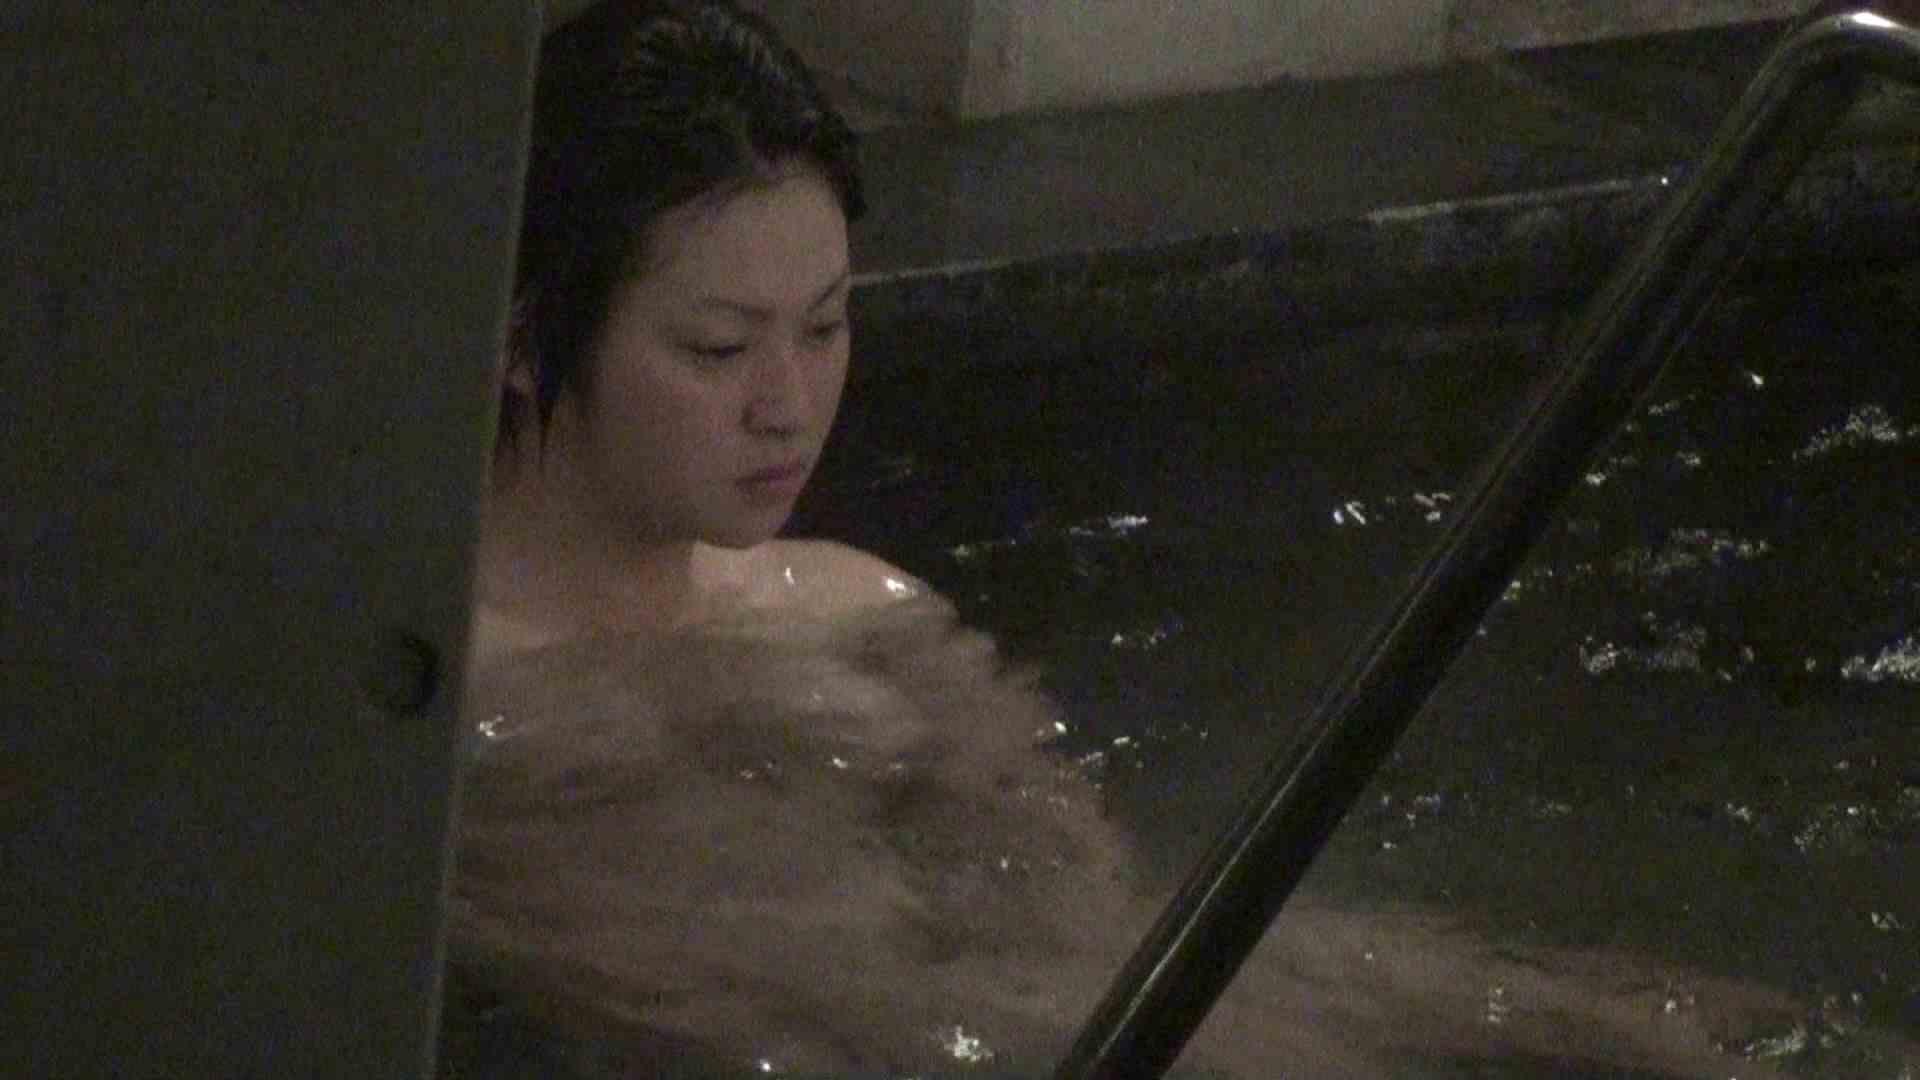 Aquaな露天風呂Vol.338 露天 AV動画キャプチャ 101pic 99